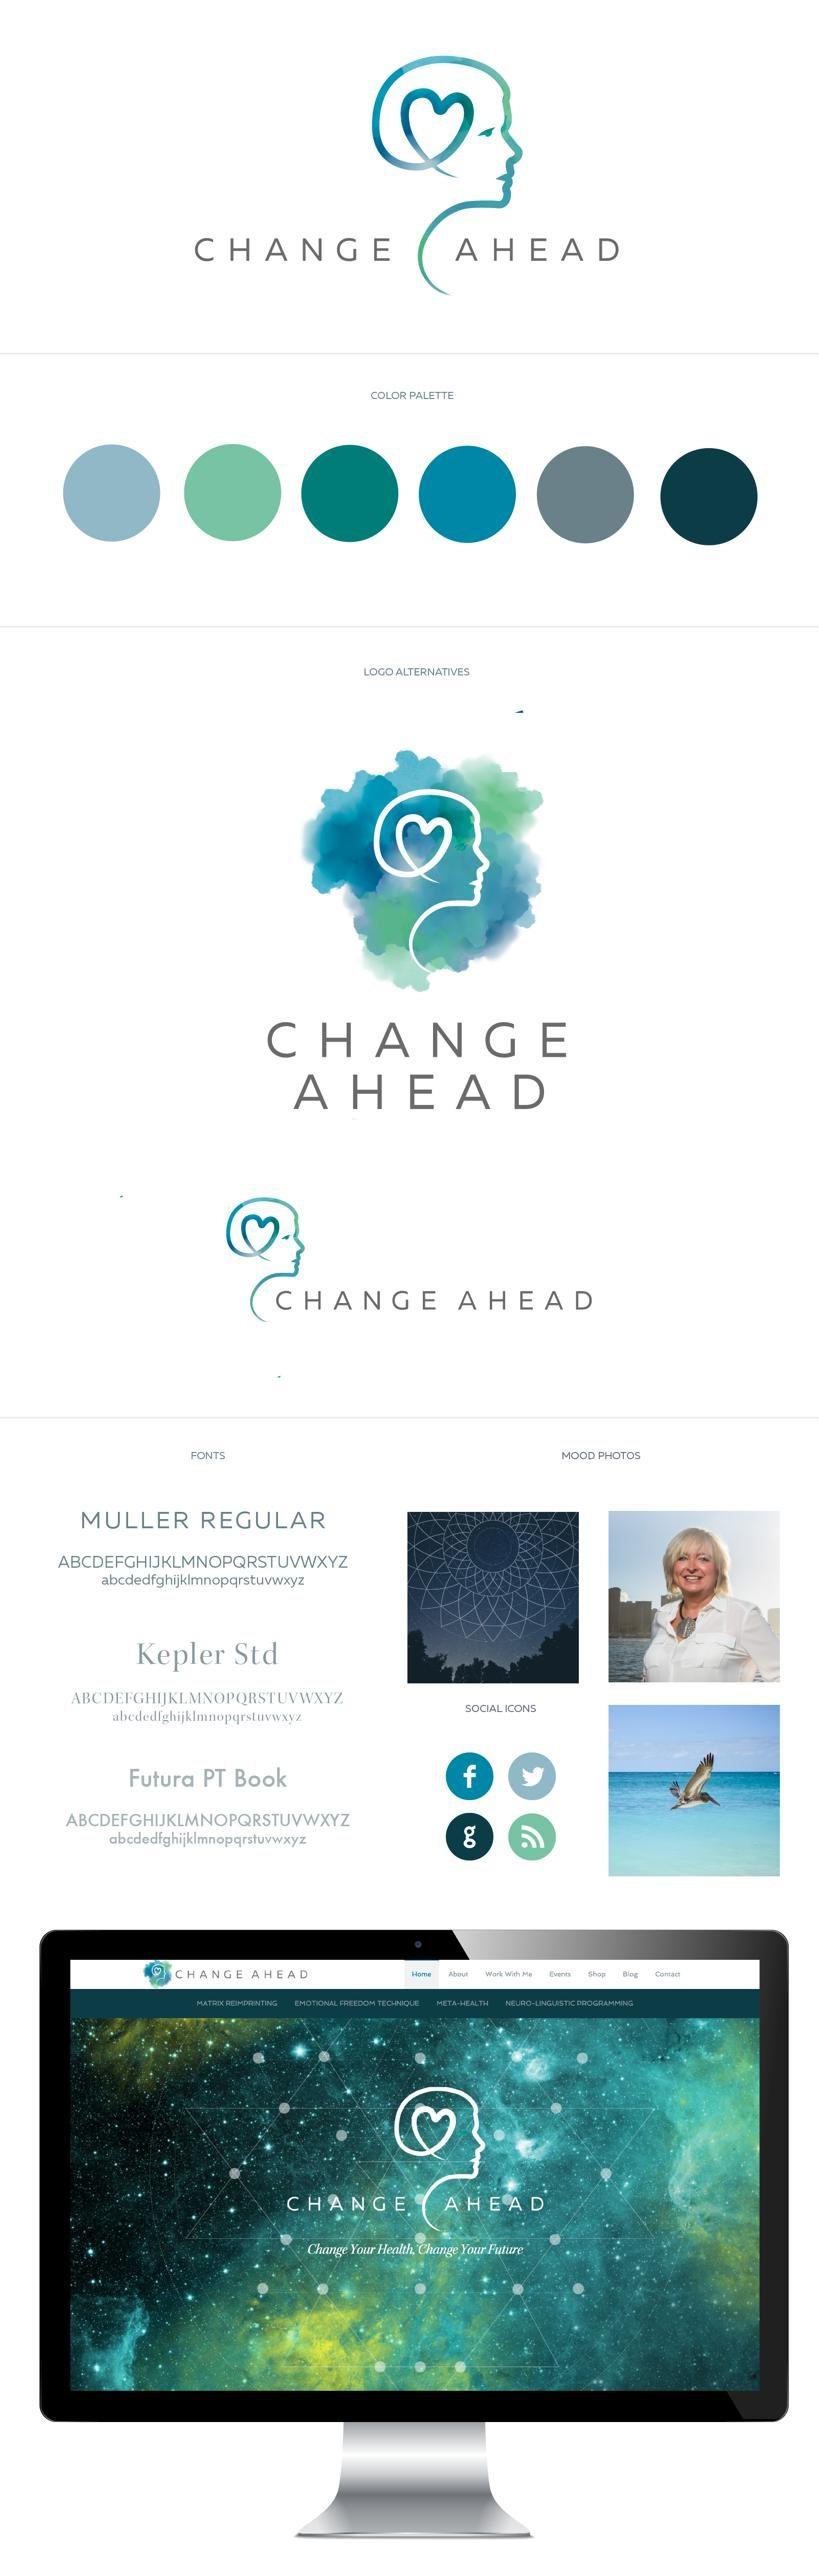 Change Ahead Identity Design RKA ink